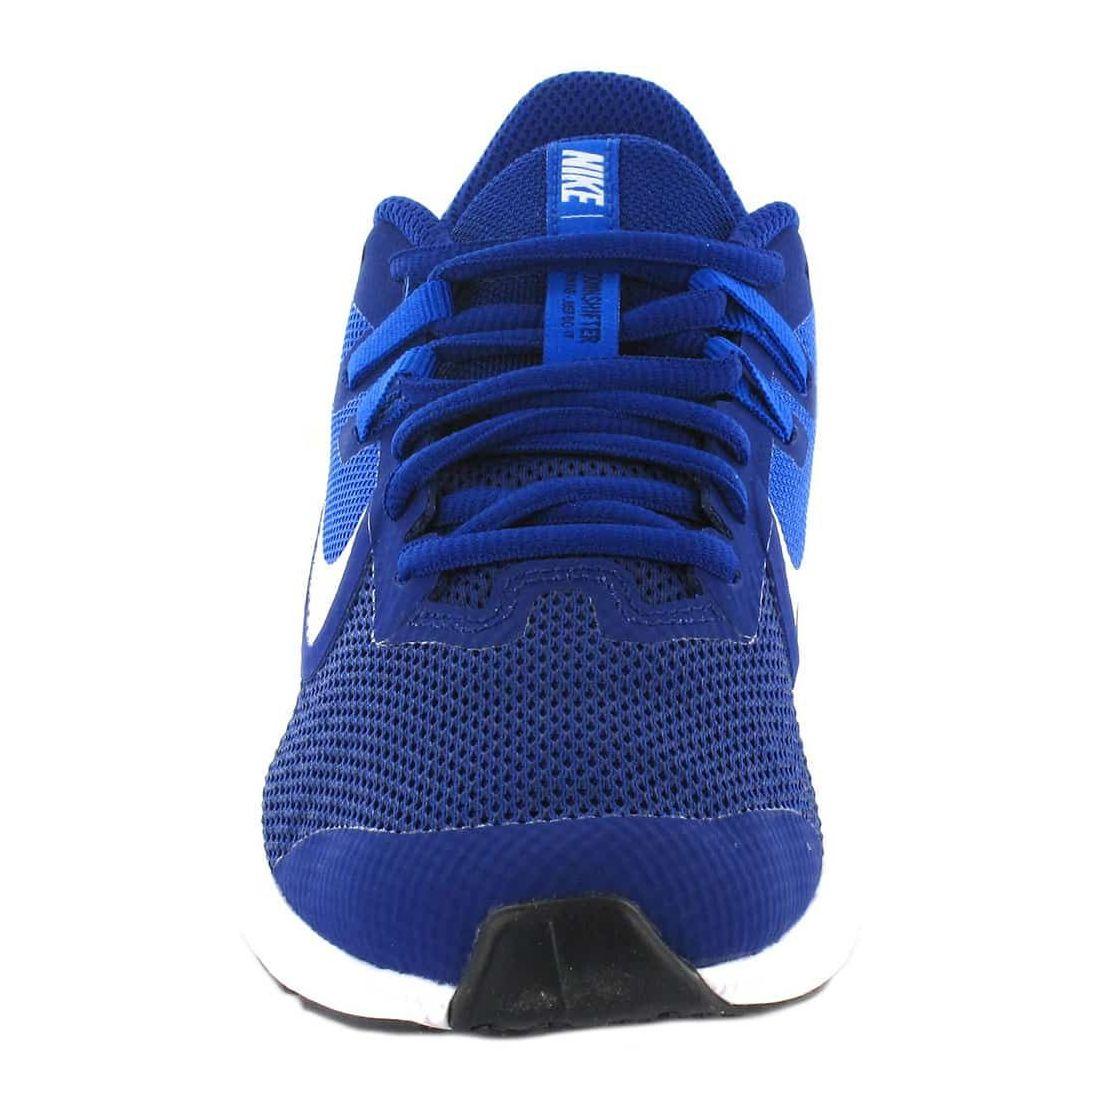 Amarillento brumoso nada  Nike Downshifter 9 GS 400